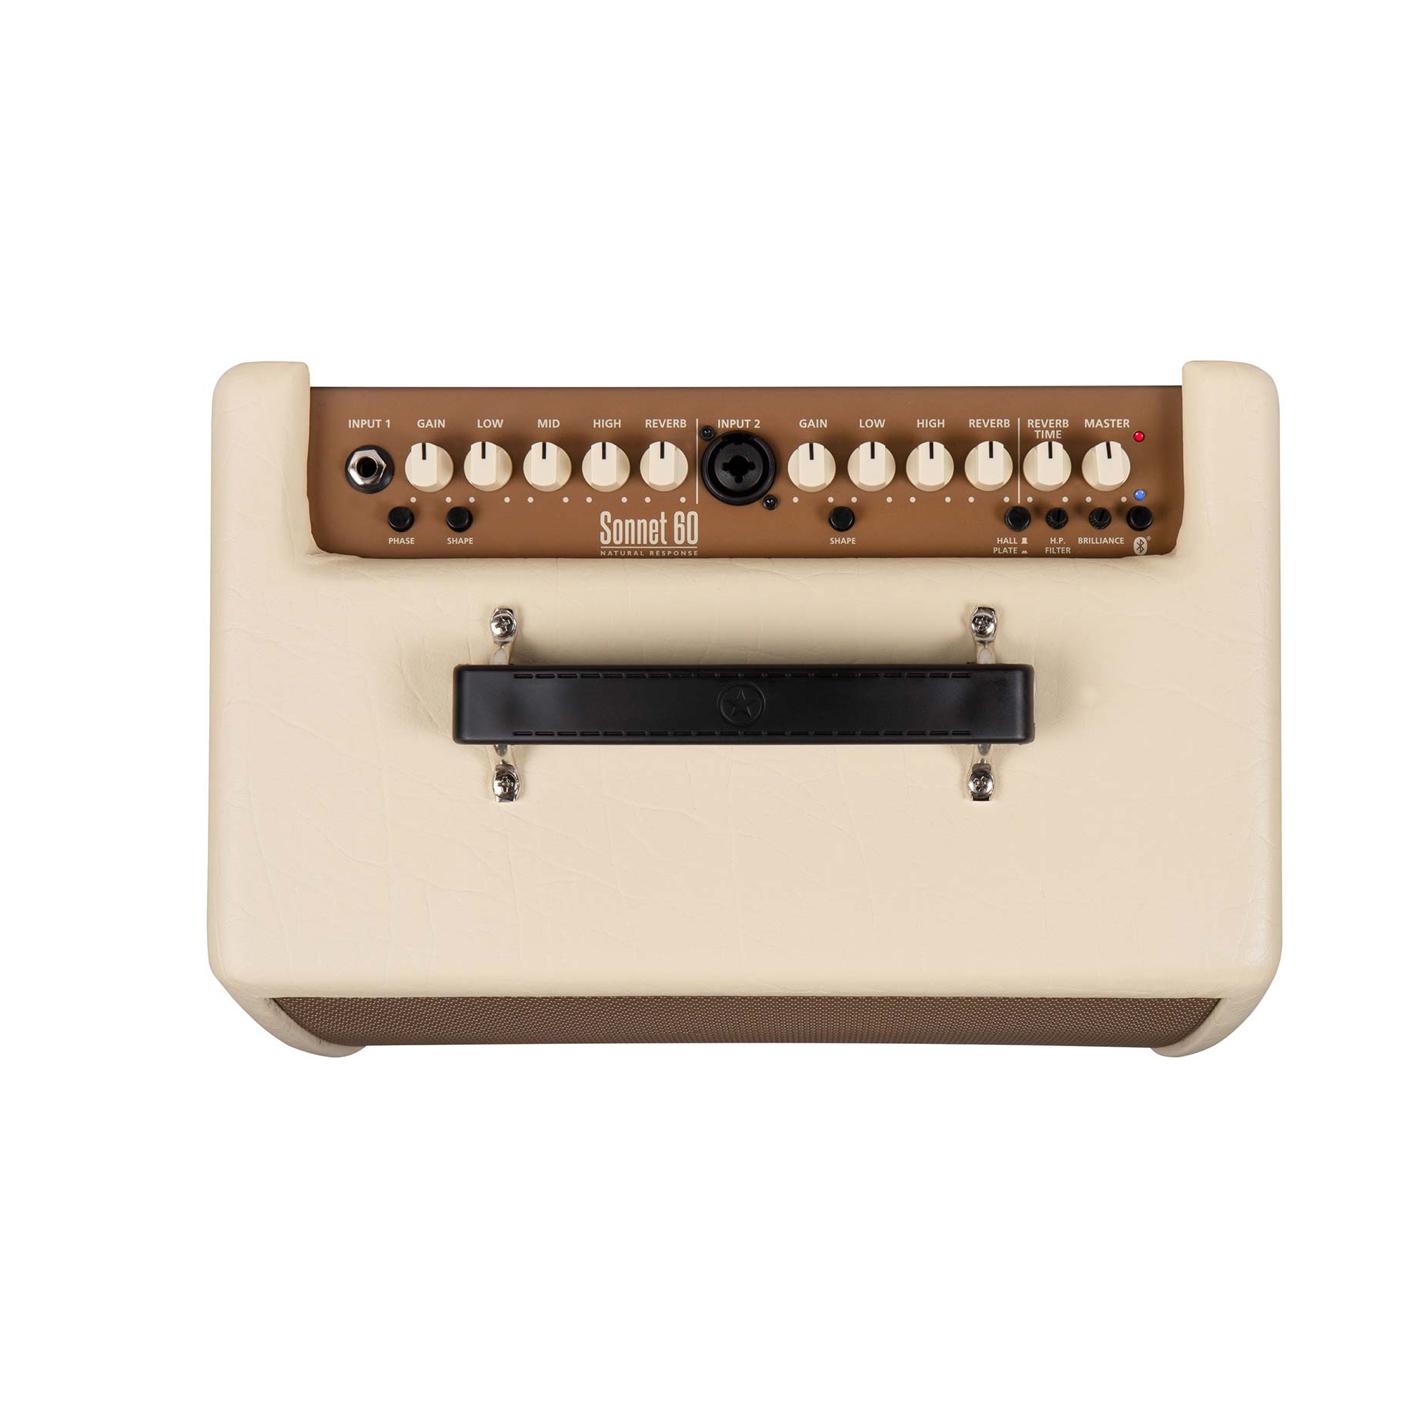 Blackstar Sonnet 60 Blonde Acoustic Amp